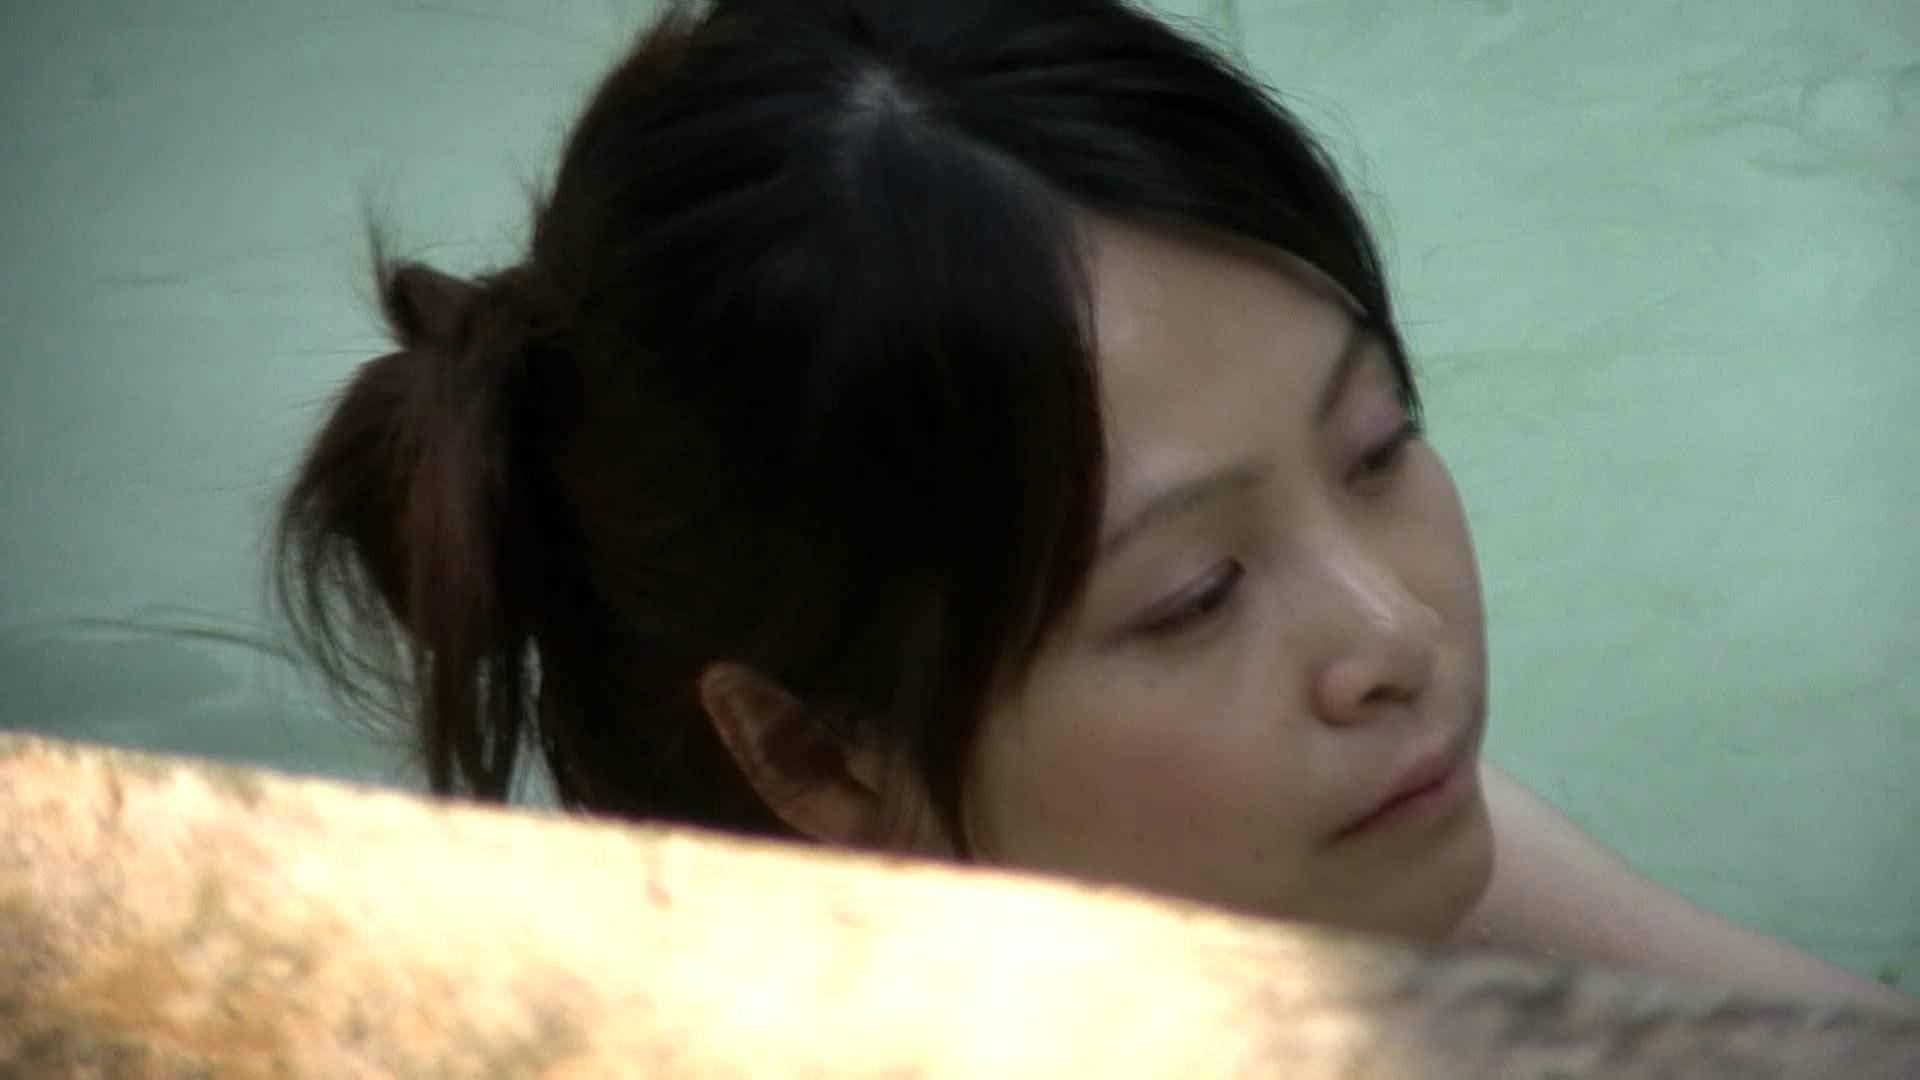 Aquaな露天風呂Vol.652 盗撮 | HなOL  105pic 15